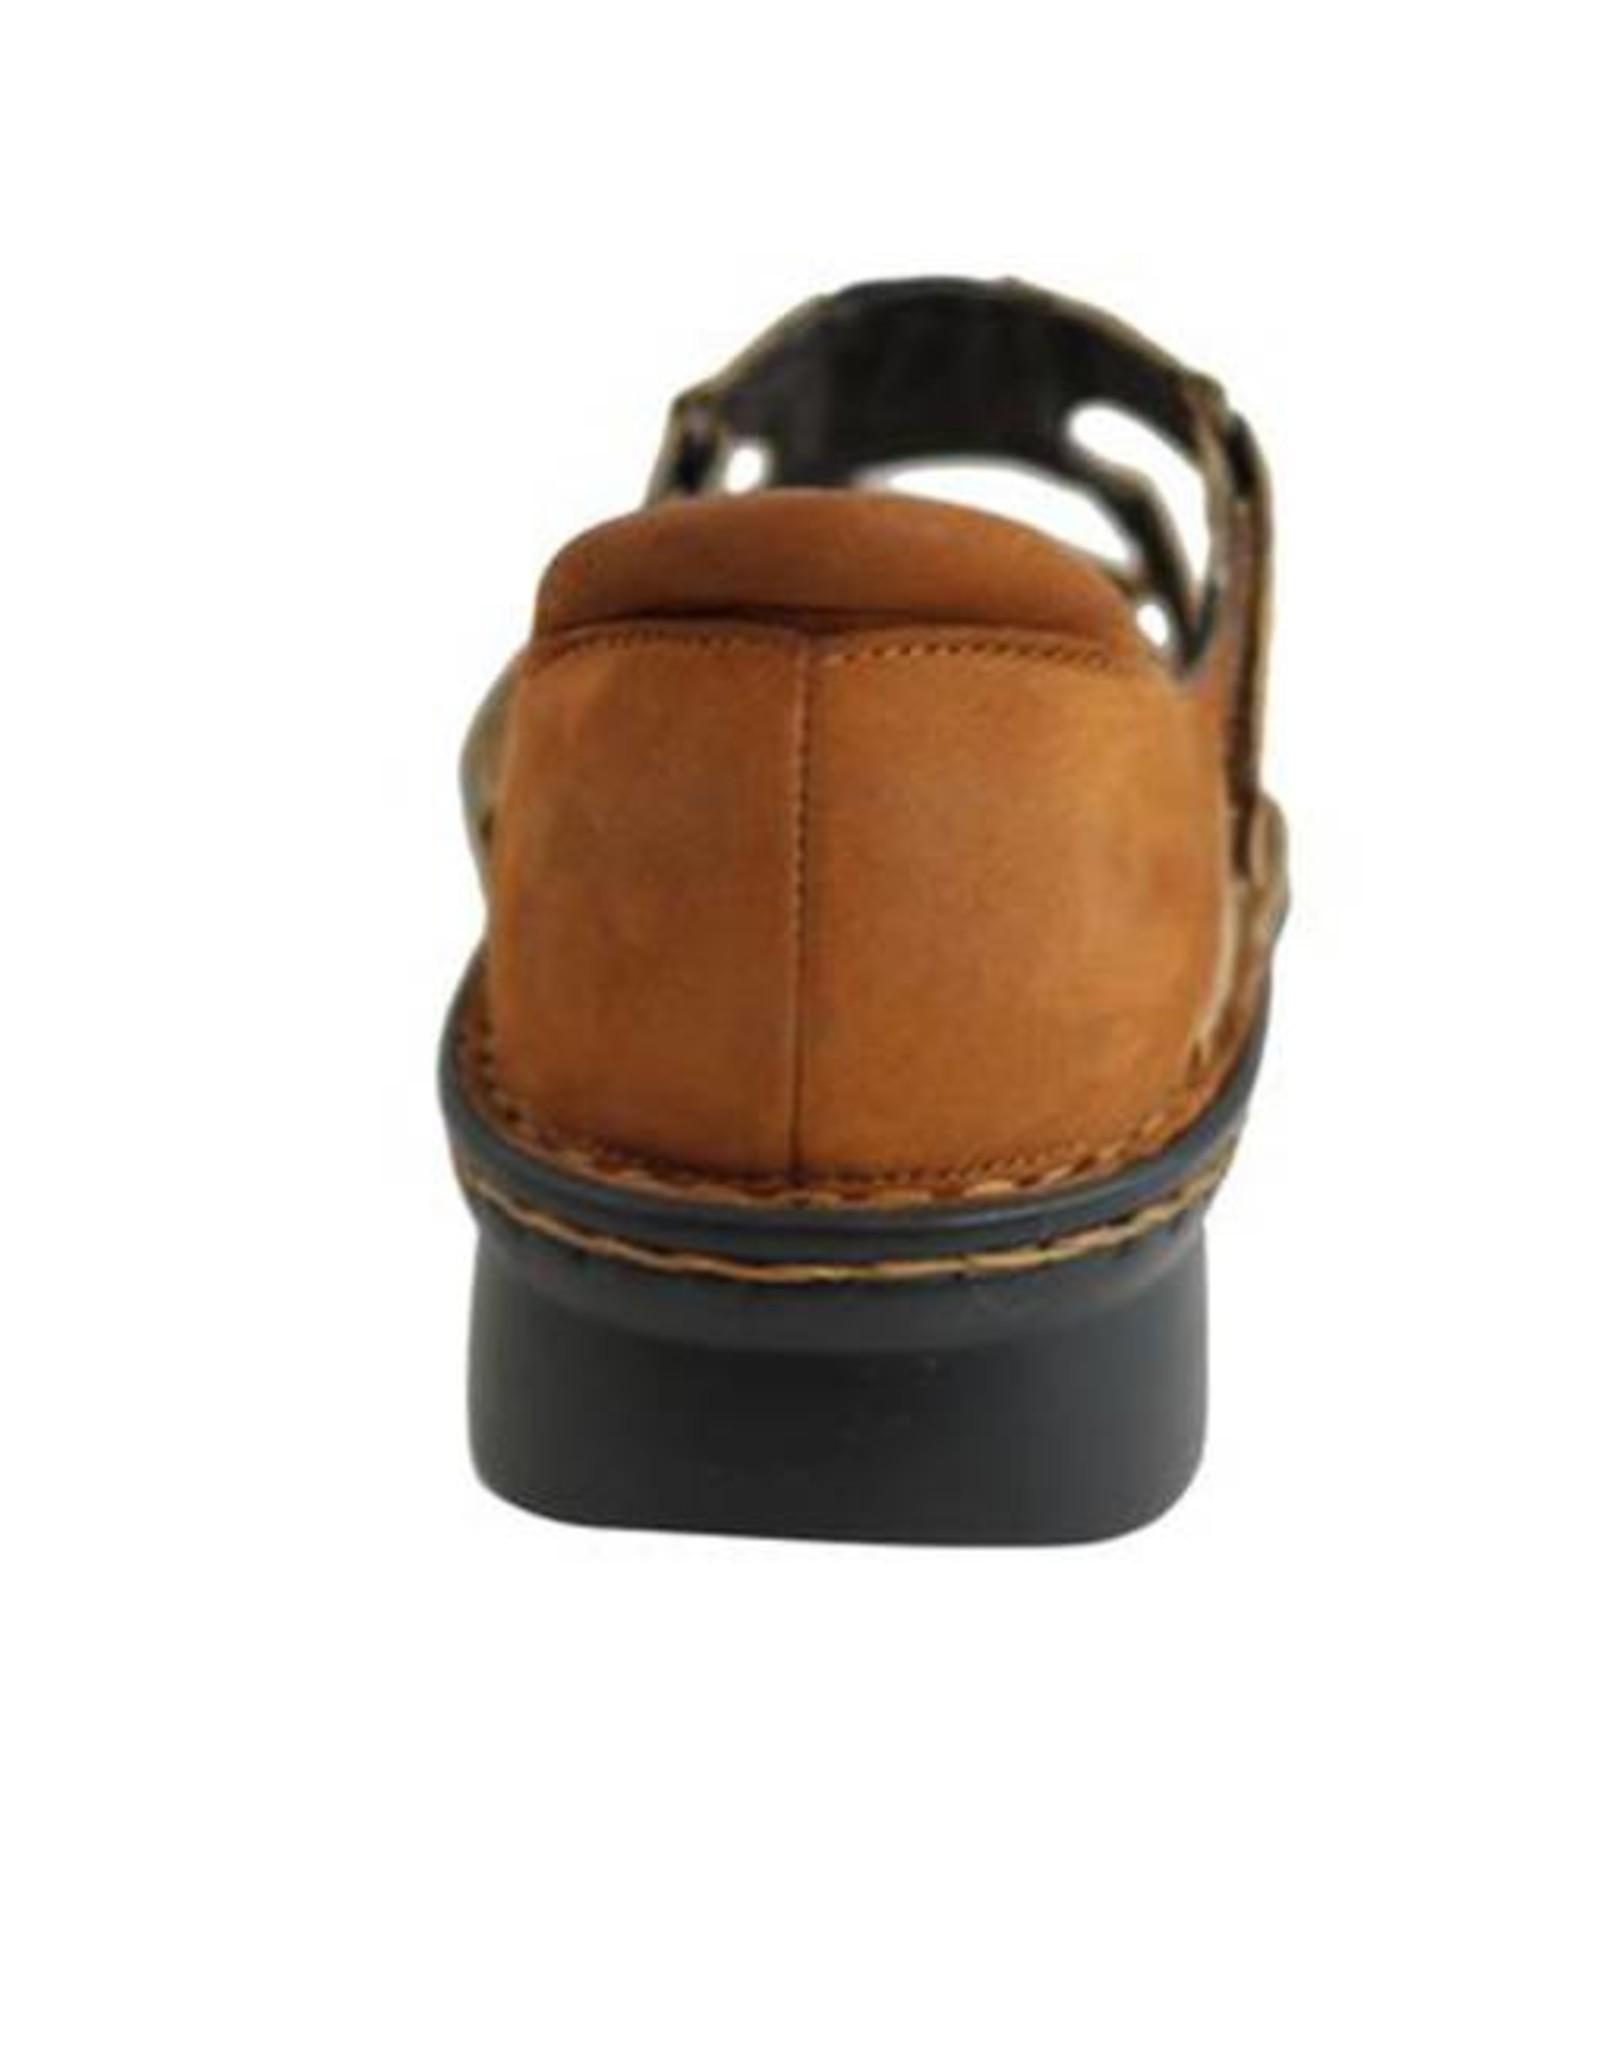 Naot Footwear Figaro in Latte Brown Combo